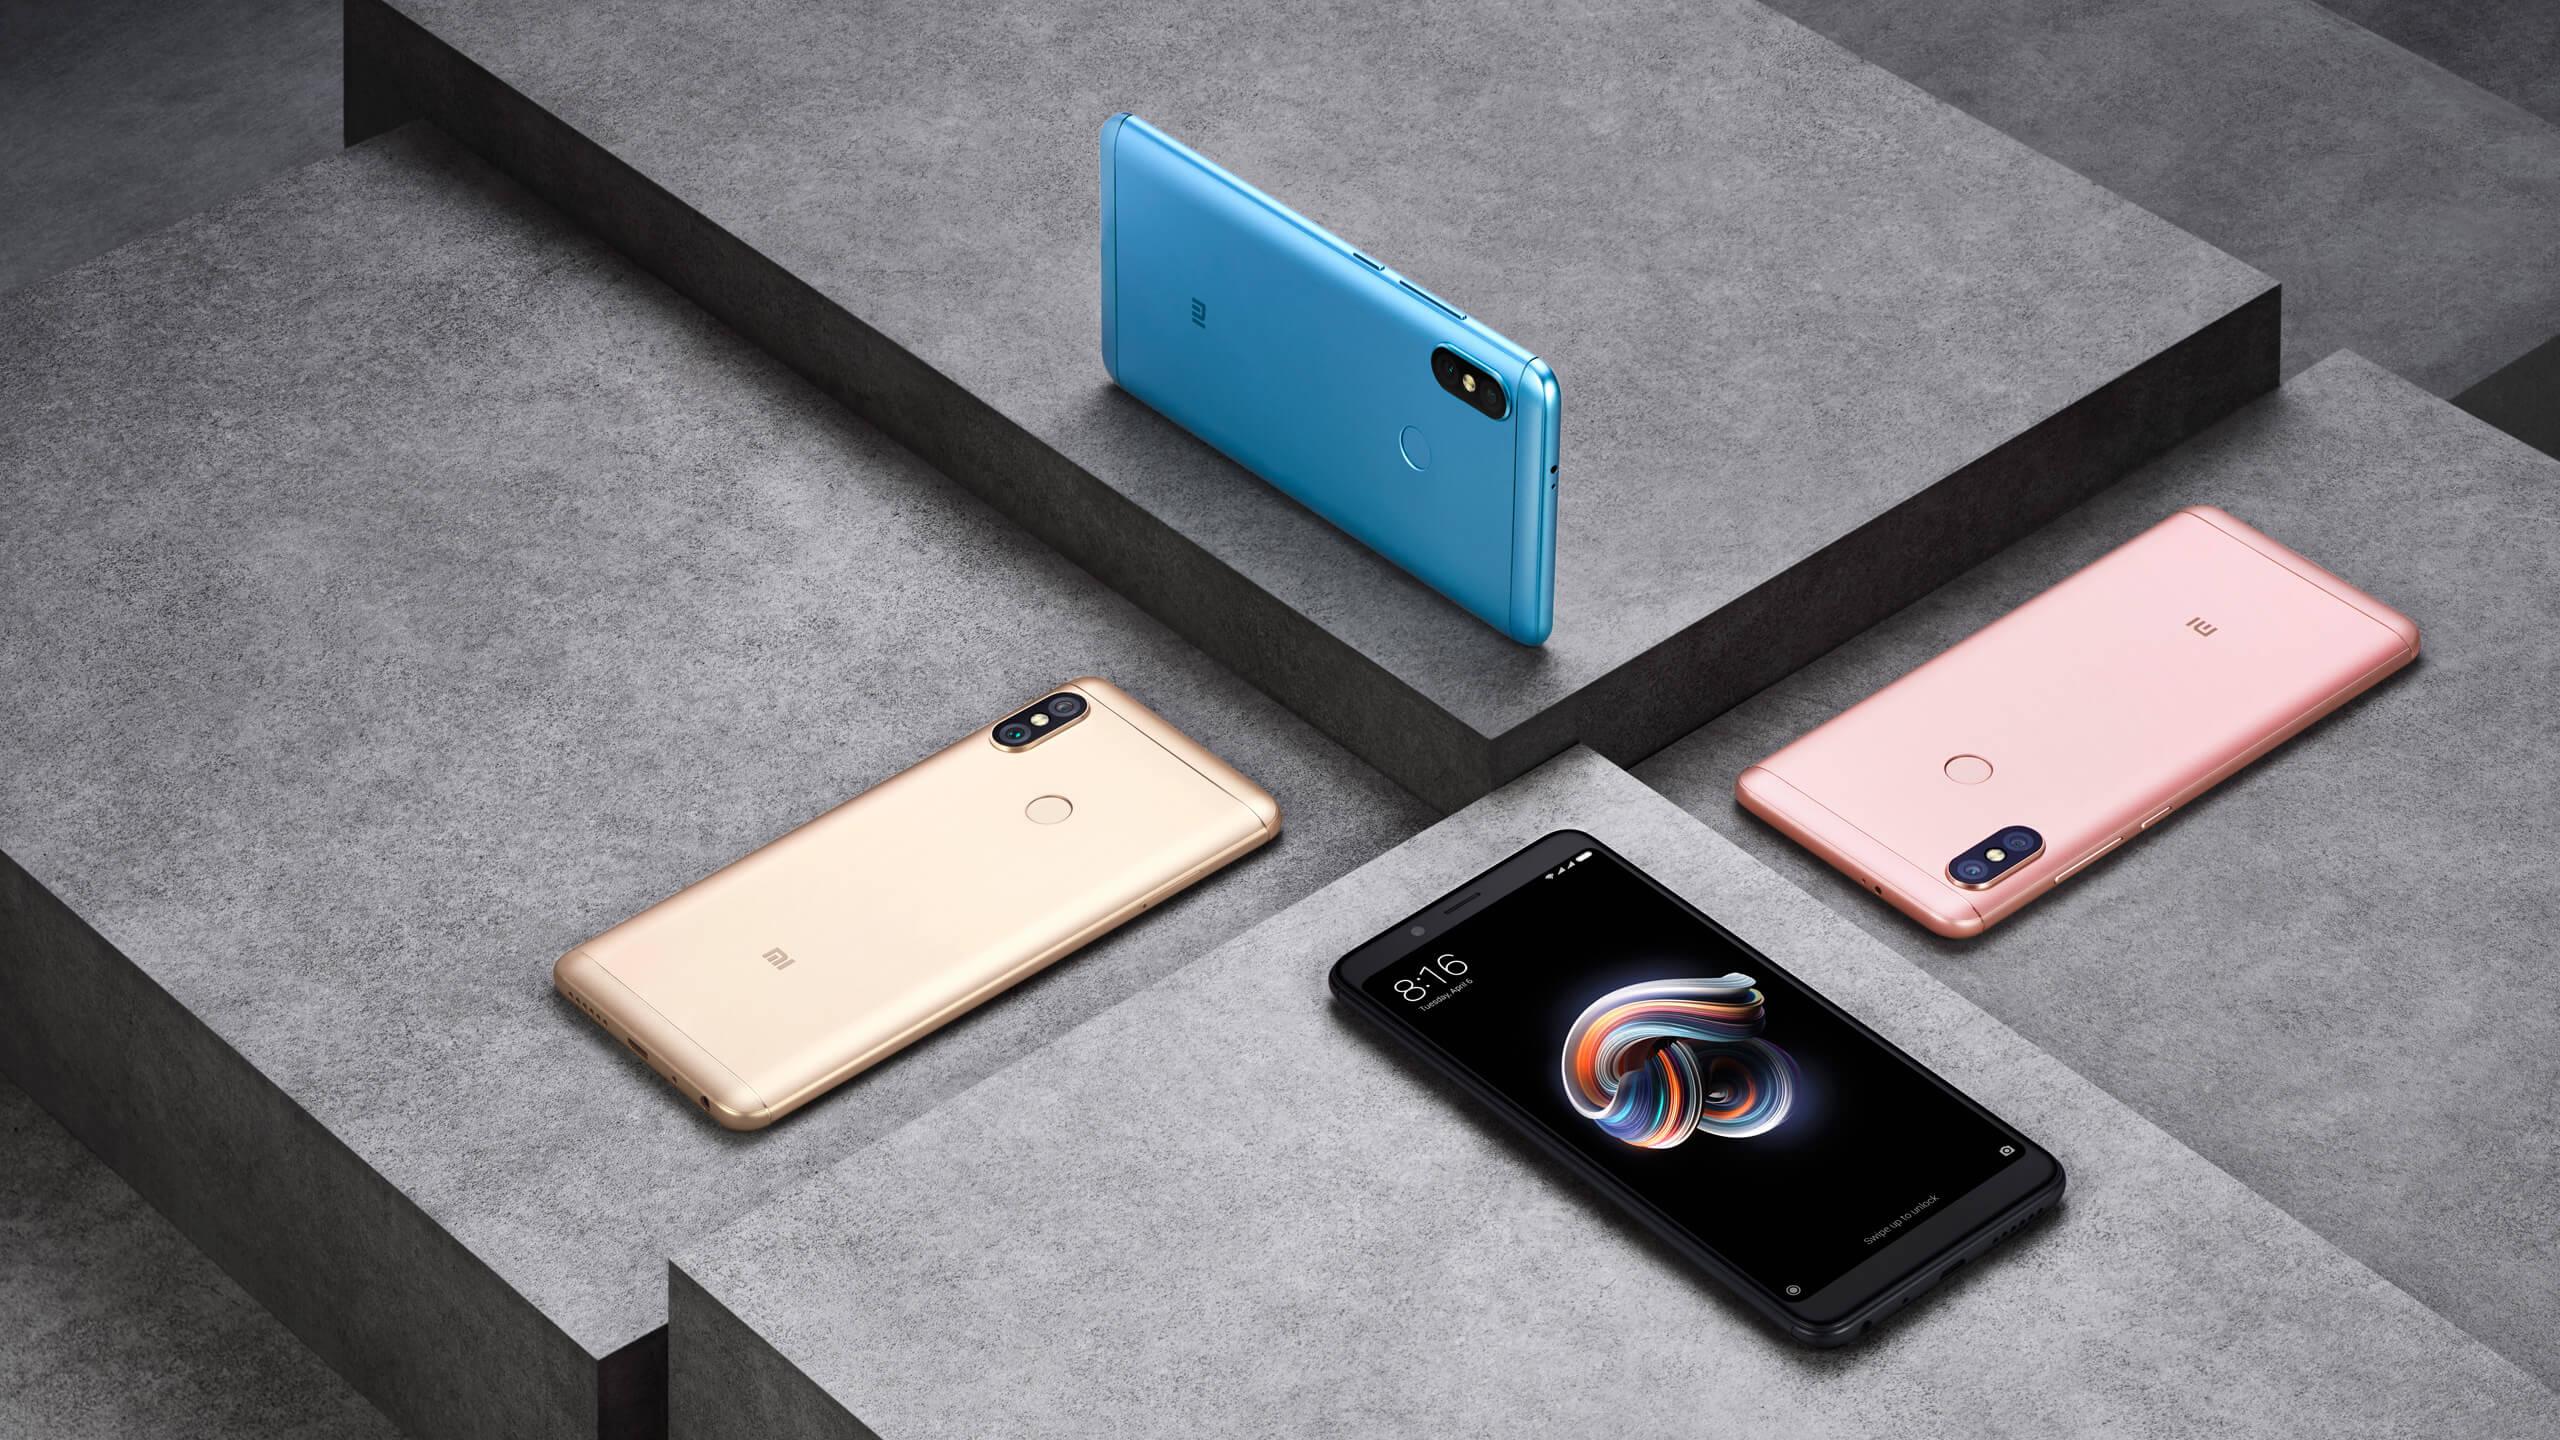 Redmi Note 5 Pro Price and Features - Mi India